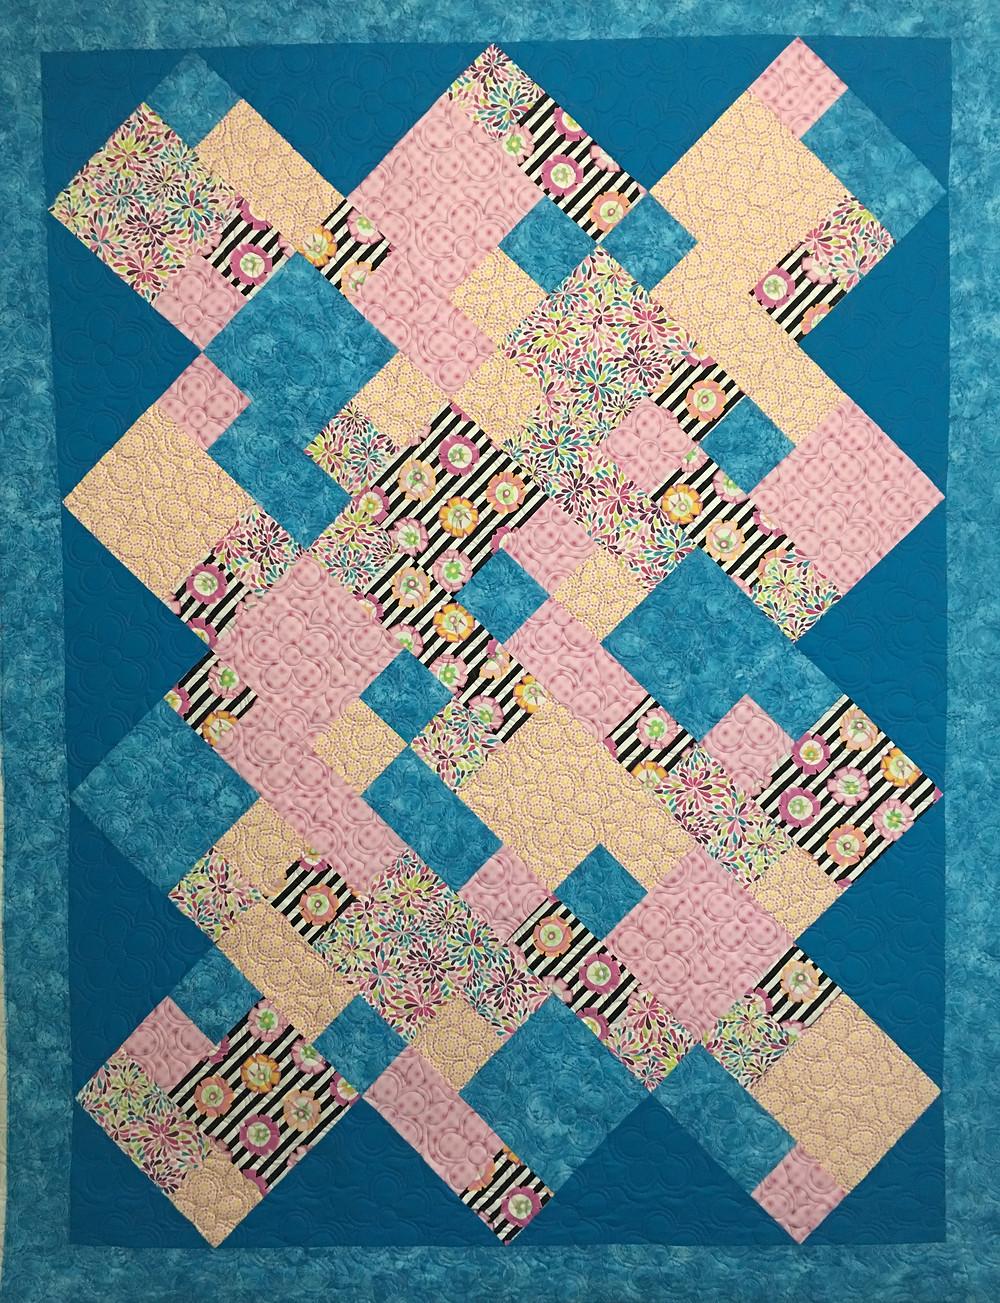 Scrappy Blocks Quilt by Charlene Lancaster